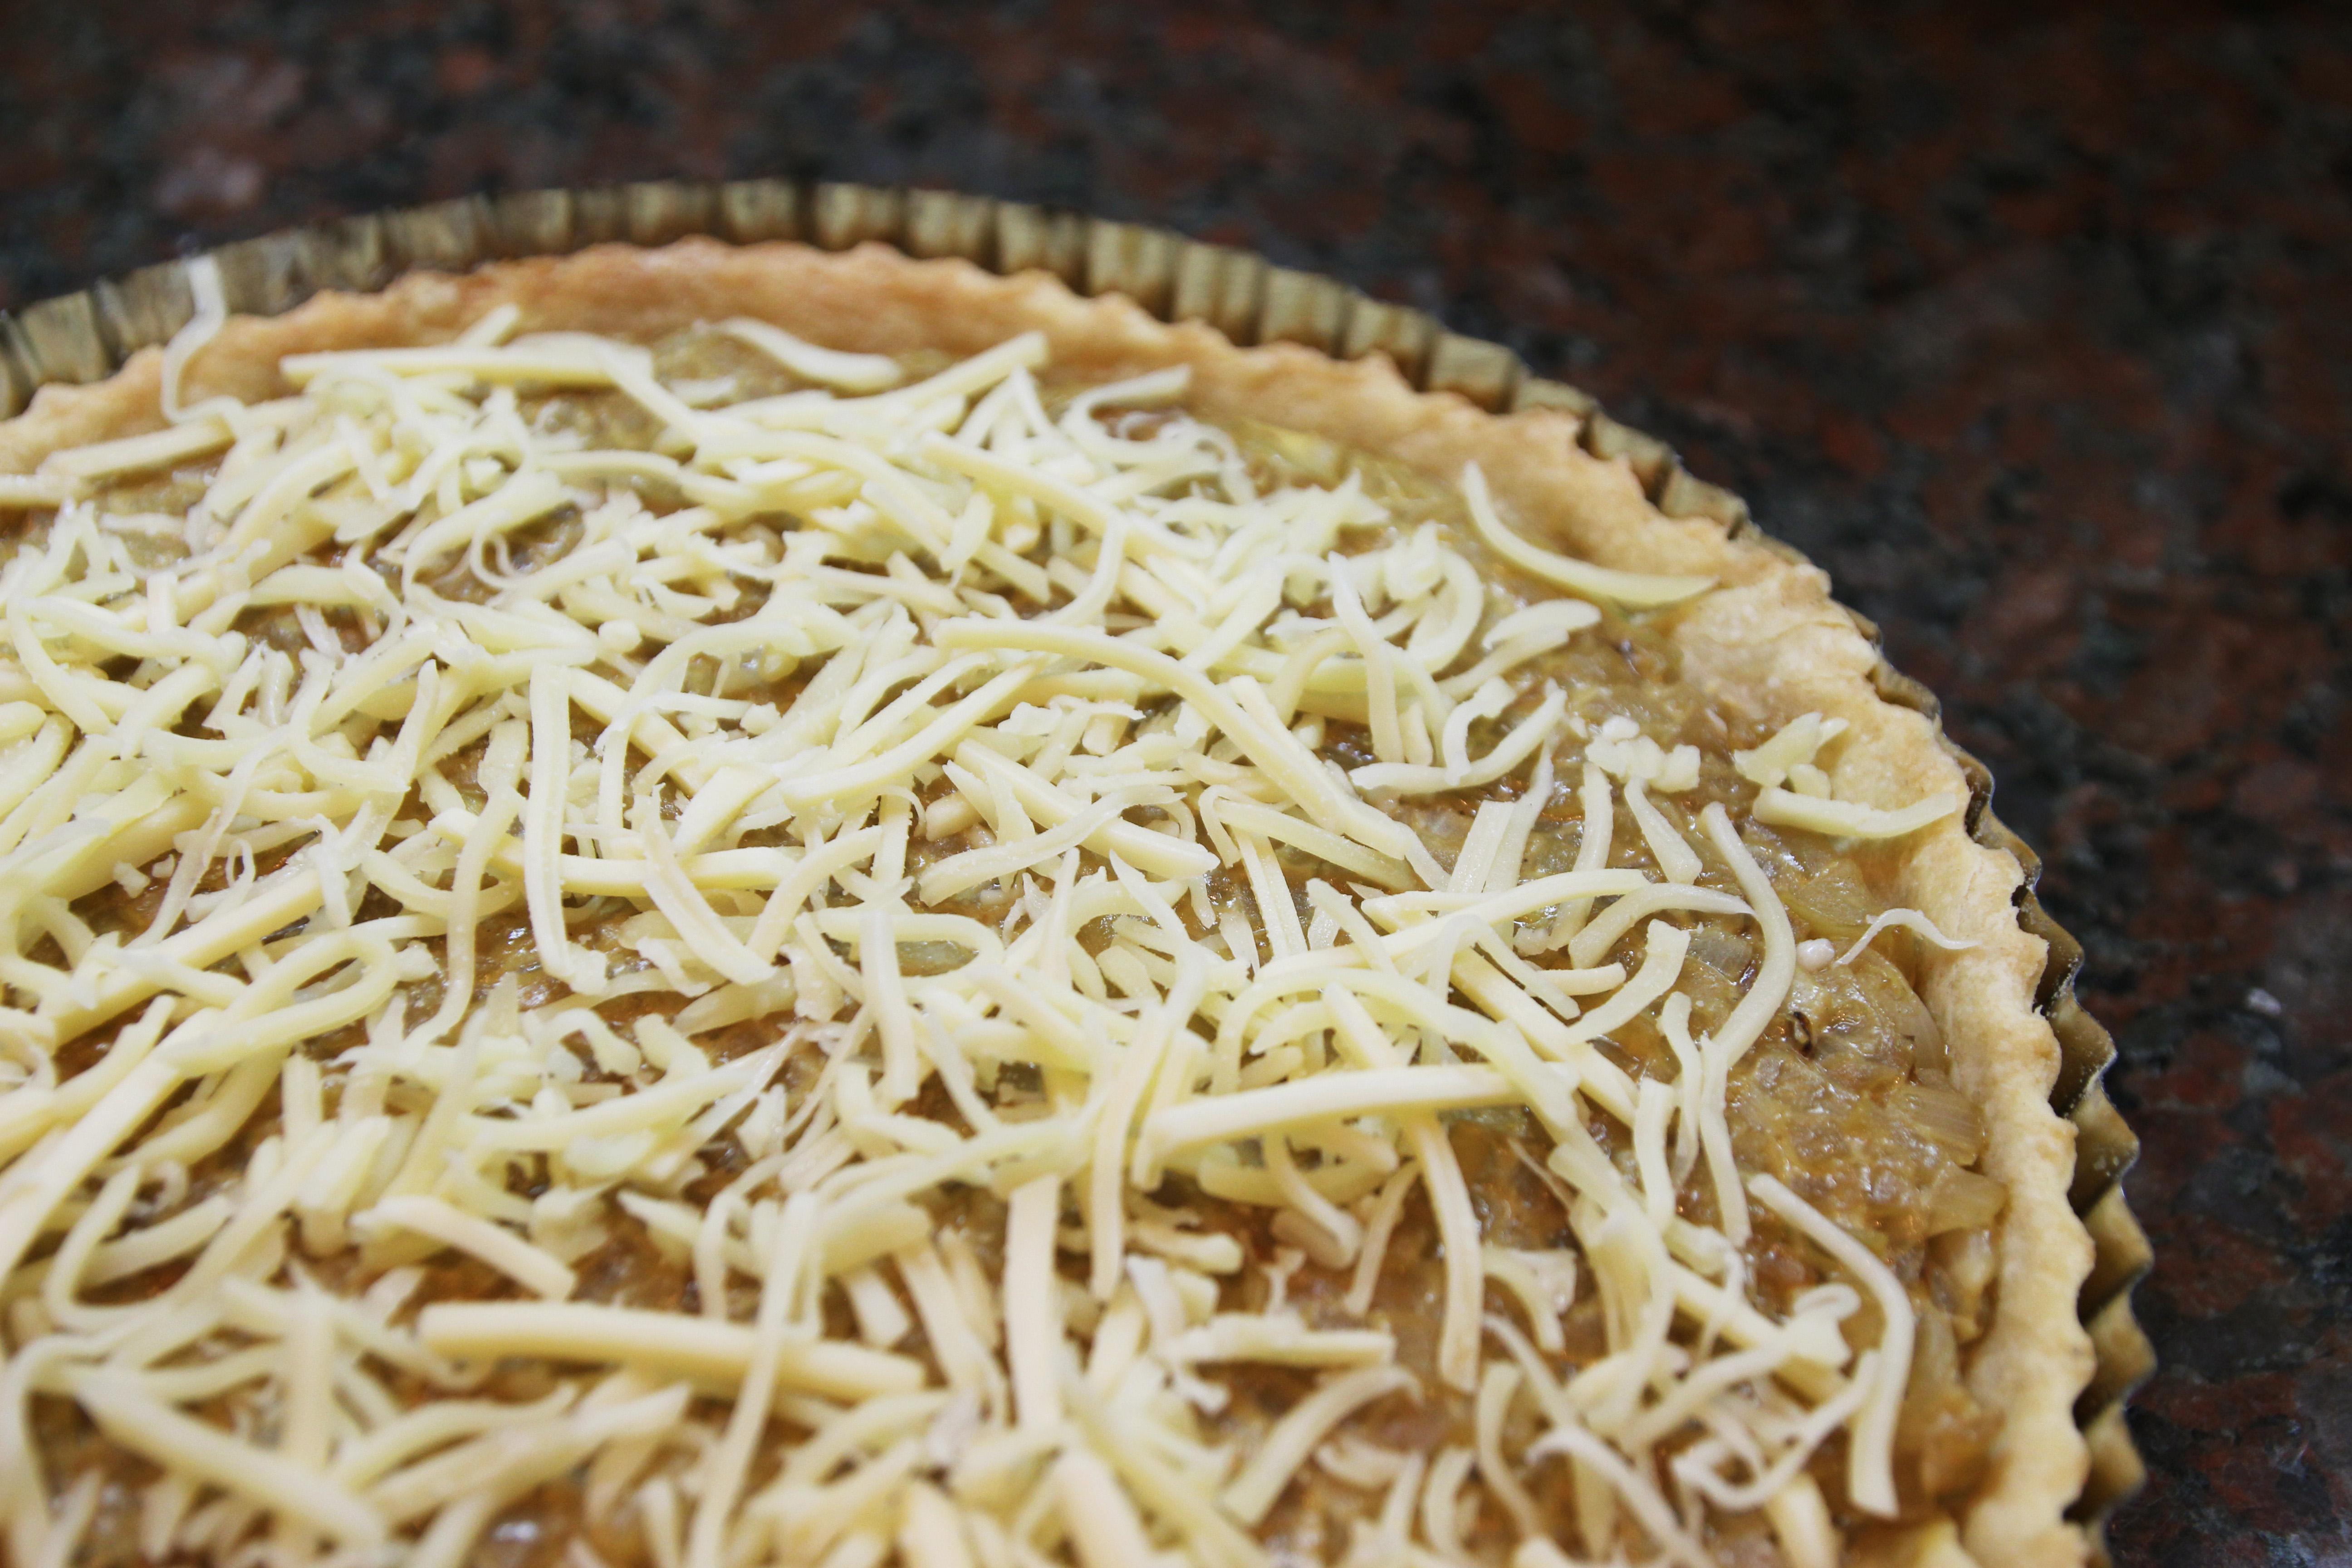 Caramelized Onion Quiche6